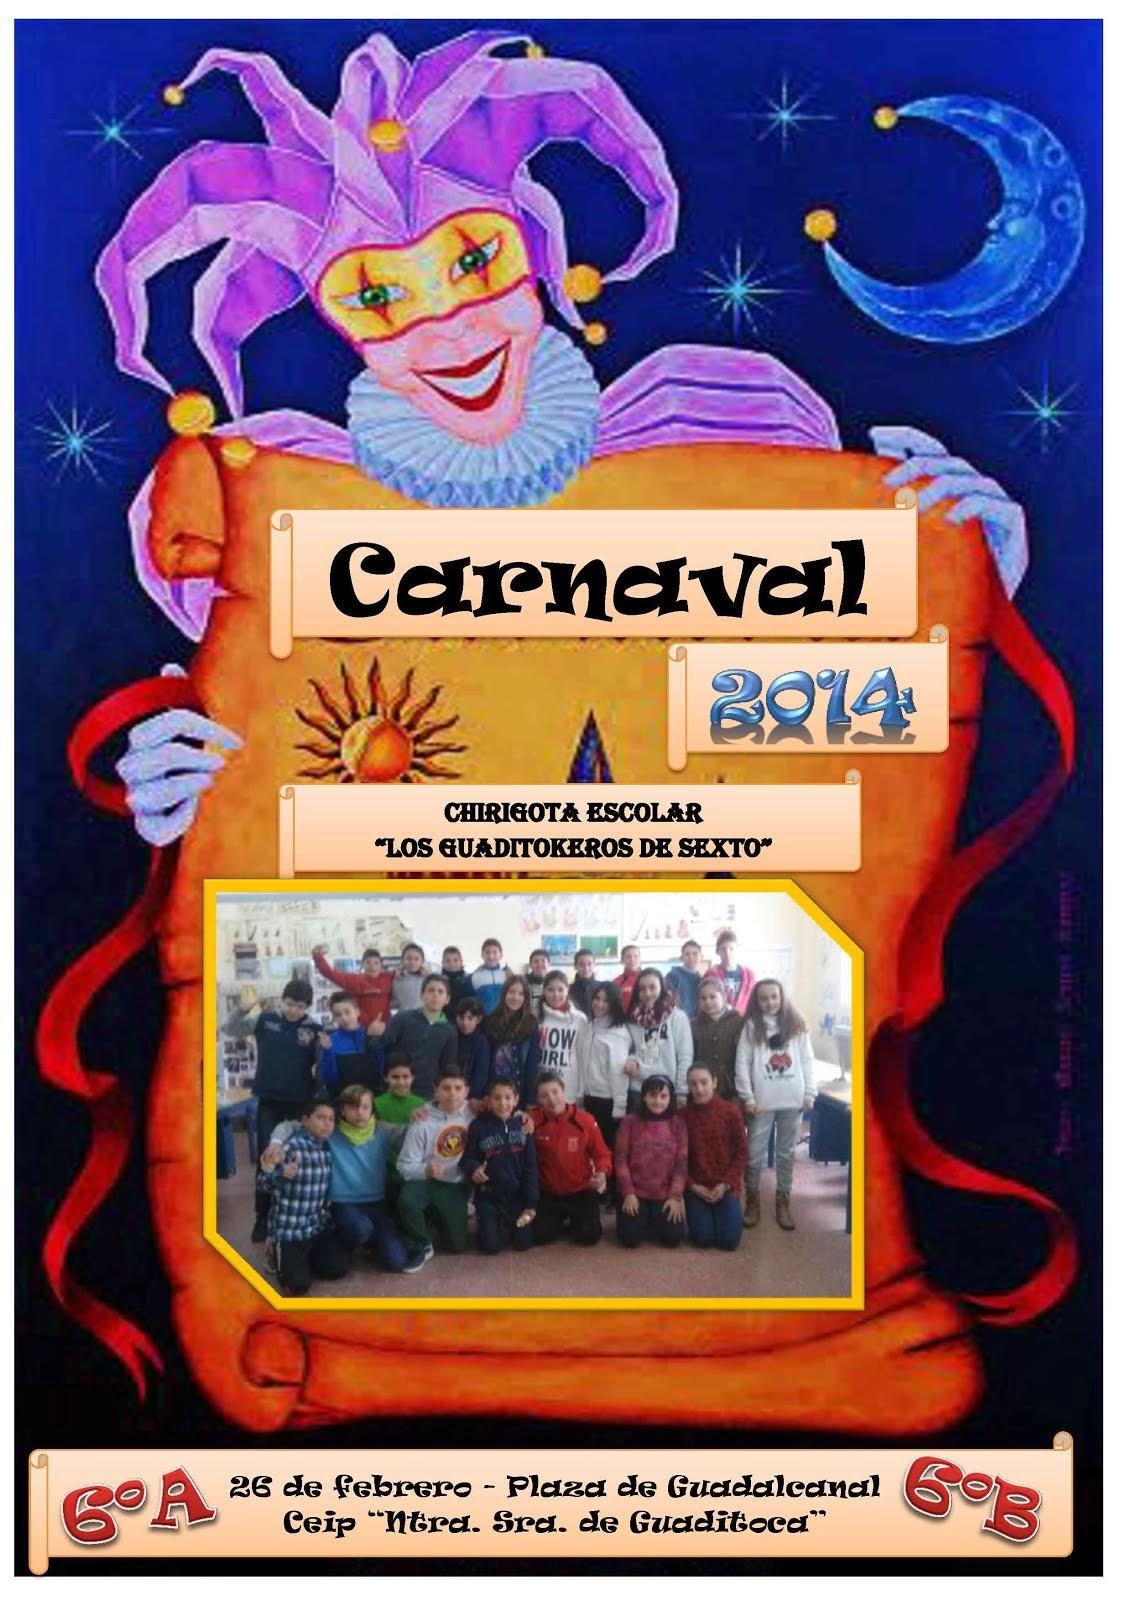 CARNAVAL 2014